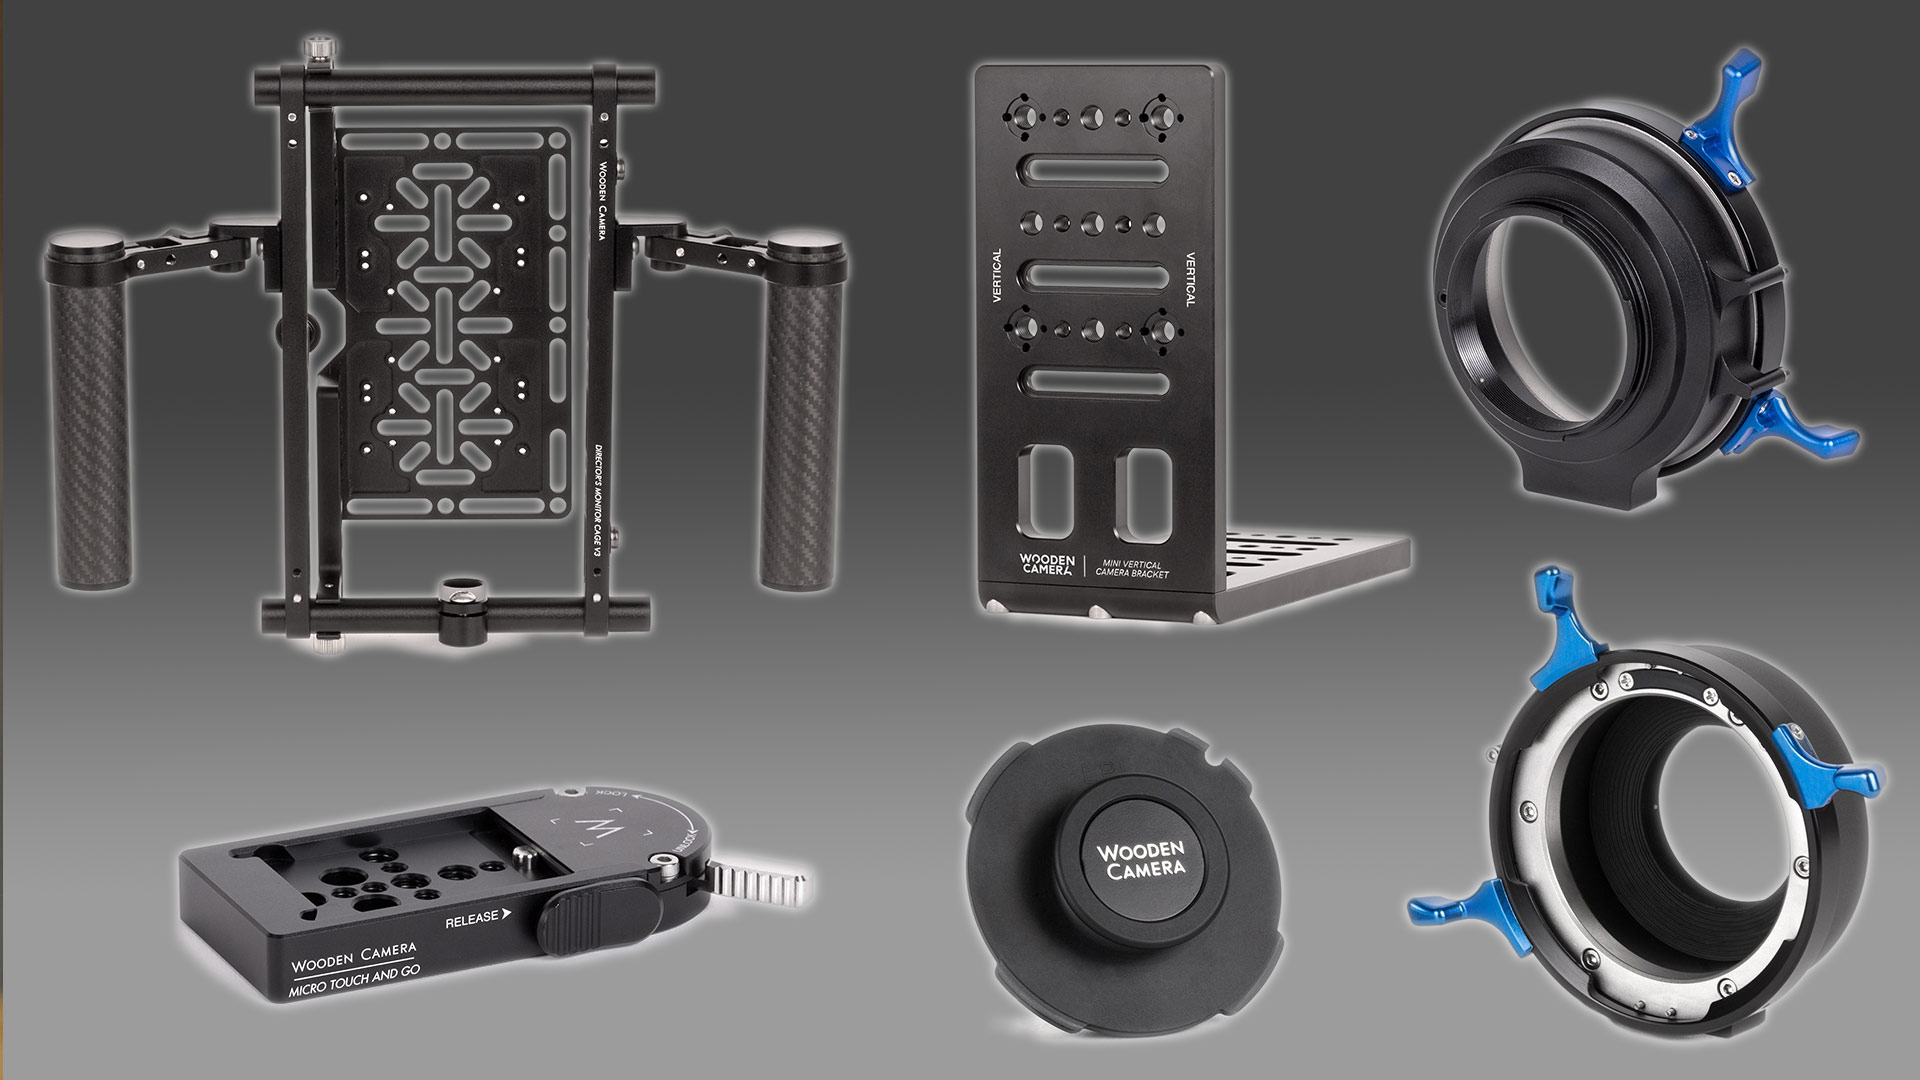 Wooden CameraがARRI LPLマウントアダプターなどを発売